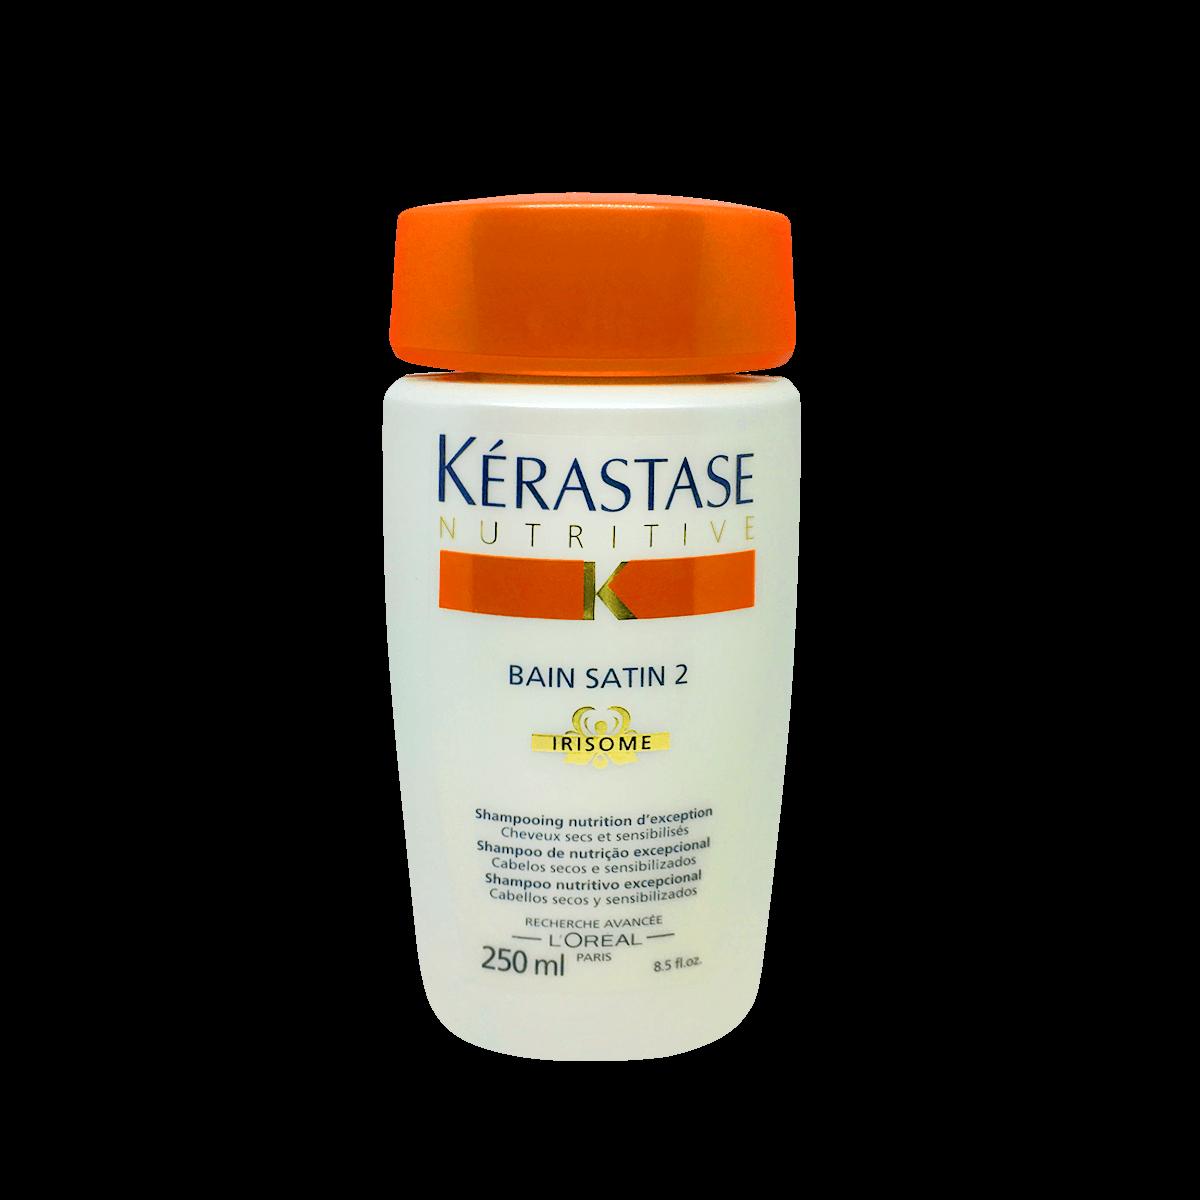 Kerastase Shampoo Nutritive Bain Satin 2 - 250ml